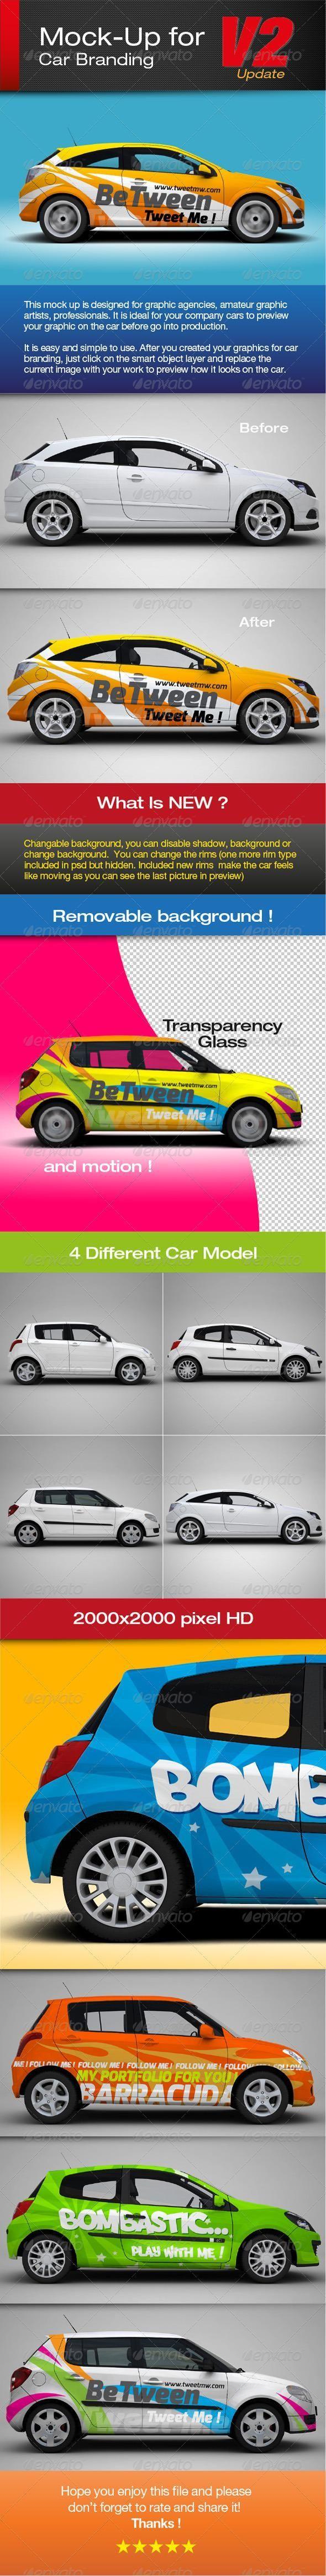 Mockup for car branding for 8 MockUp psd template